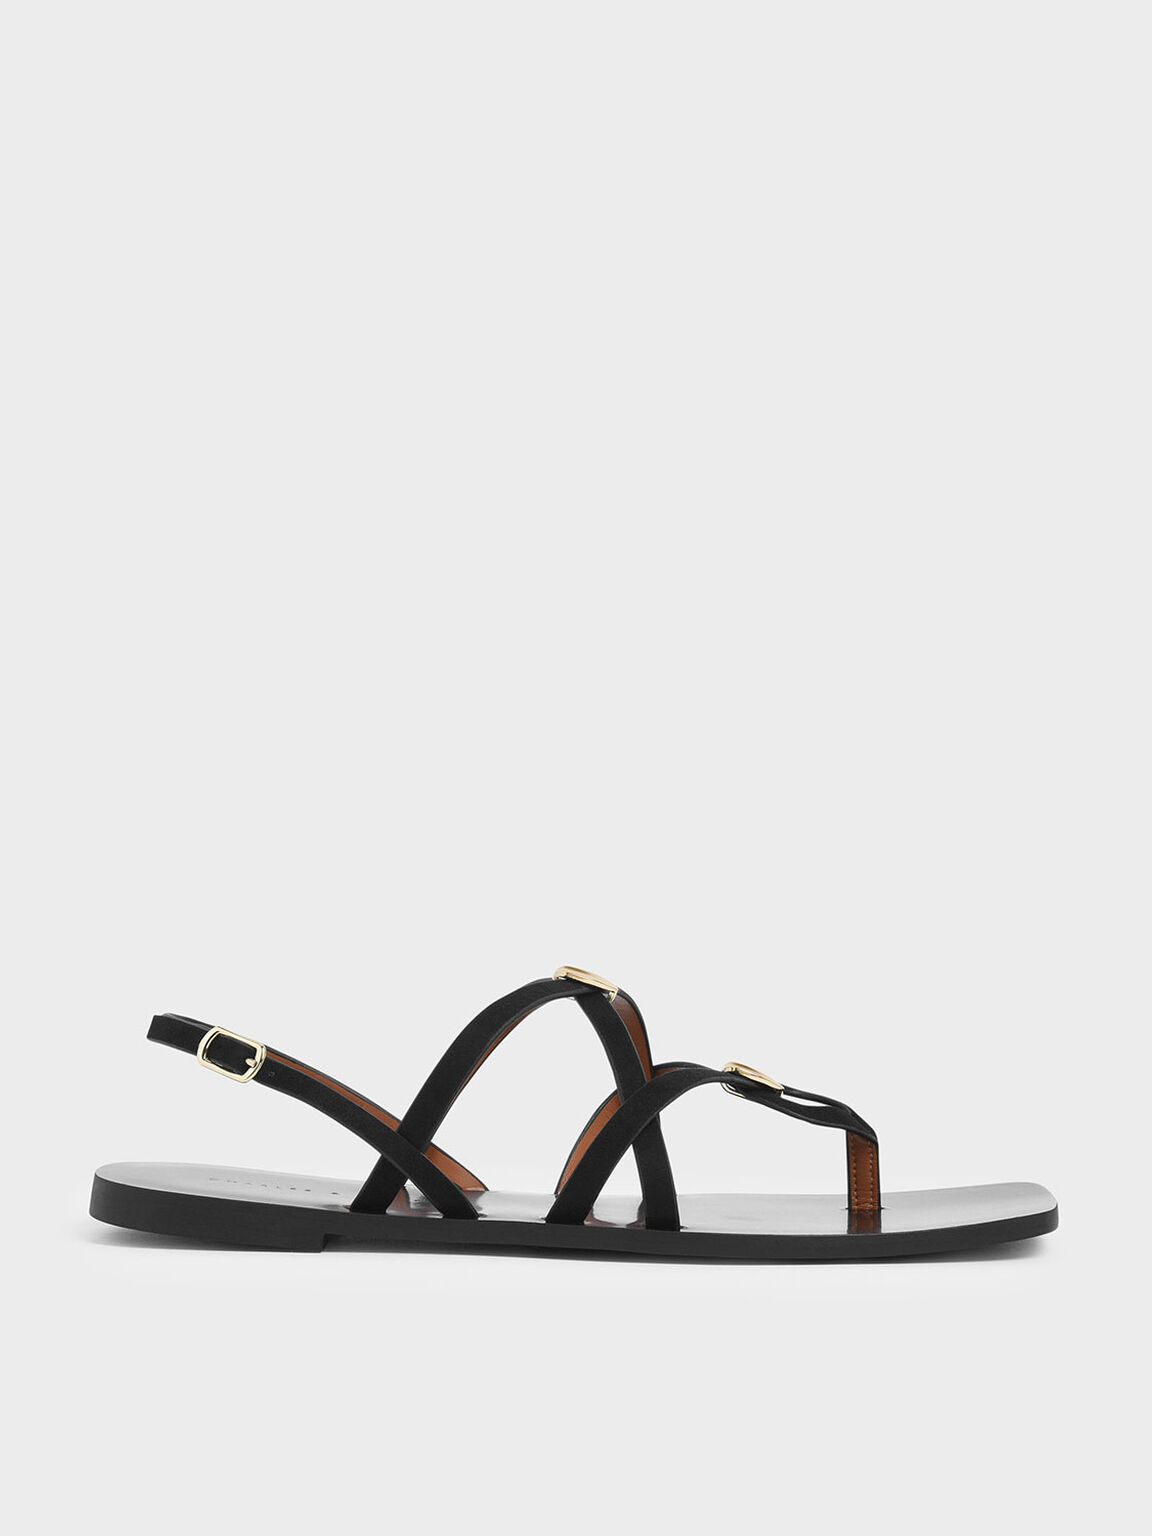 Criss Cross Metal Accent Textured Strappy Sandals, Black, hi-res